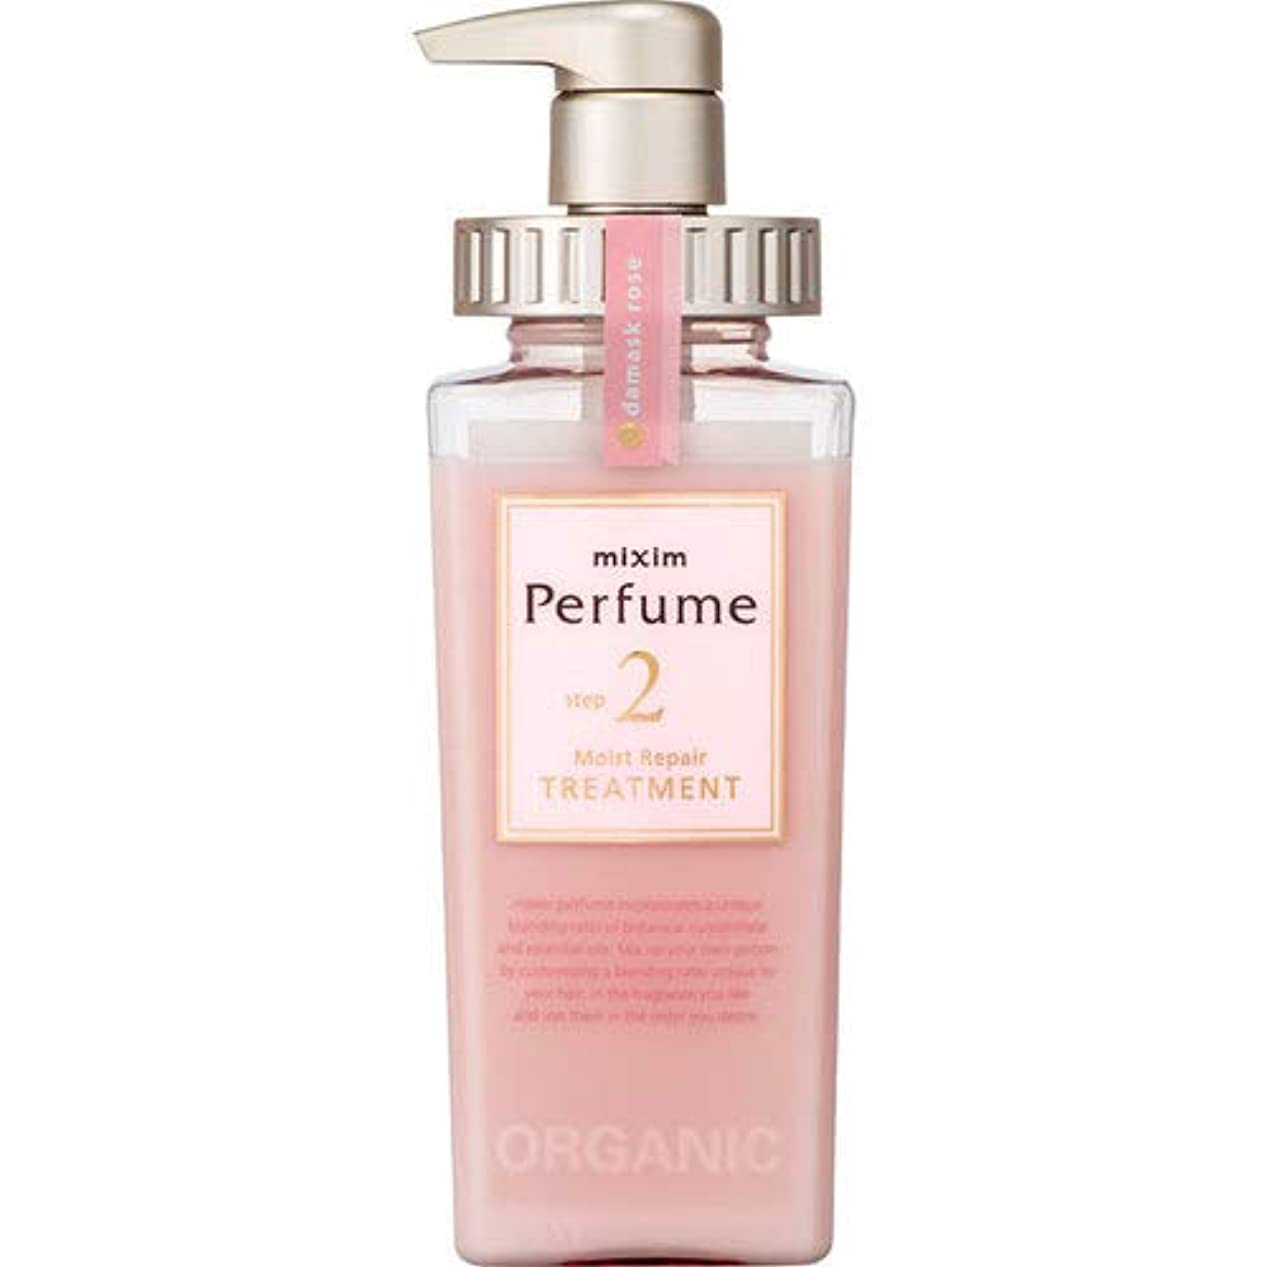 mixim Perfume(ミクシムパフューム) モイストリペア ヘアトリートメント 440g